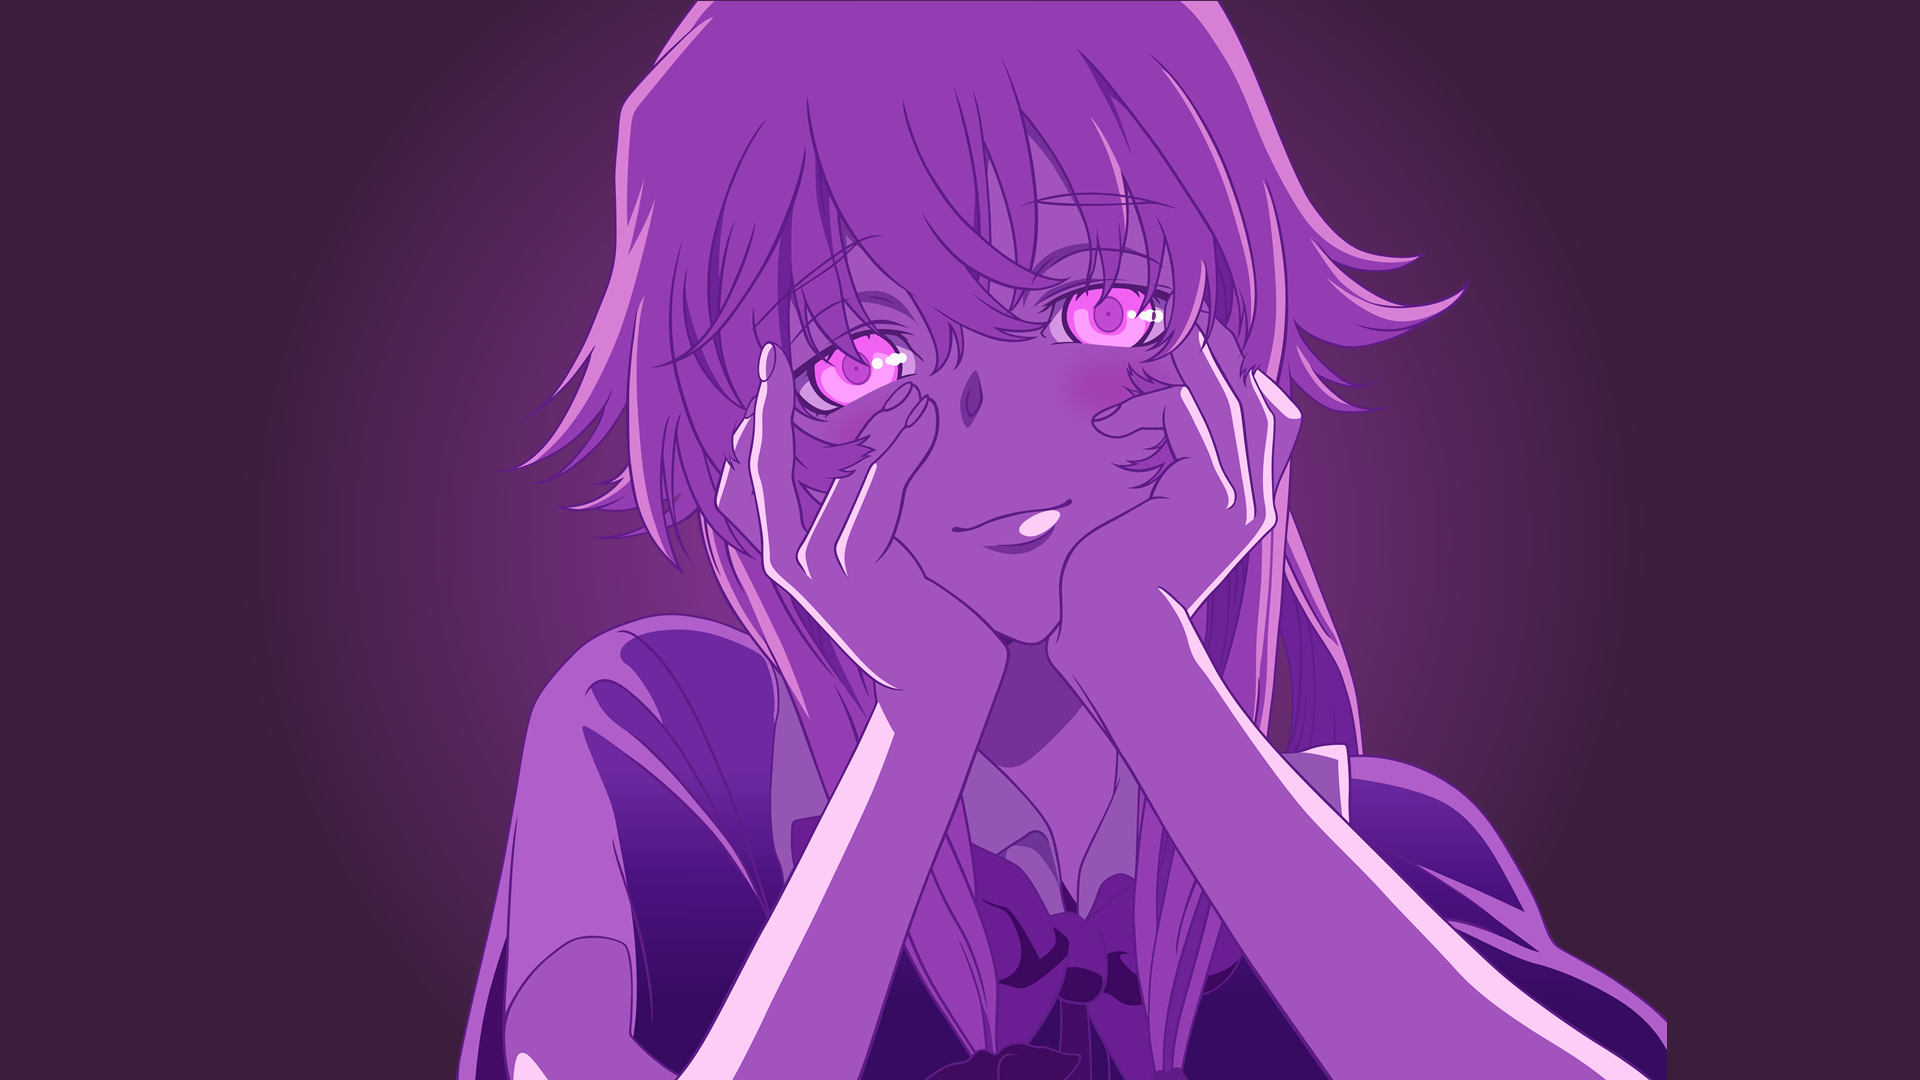 anime, Mirai Nikki, anime girls, Gasai Yuno, yandere